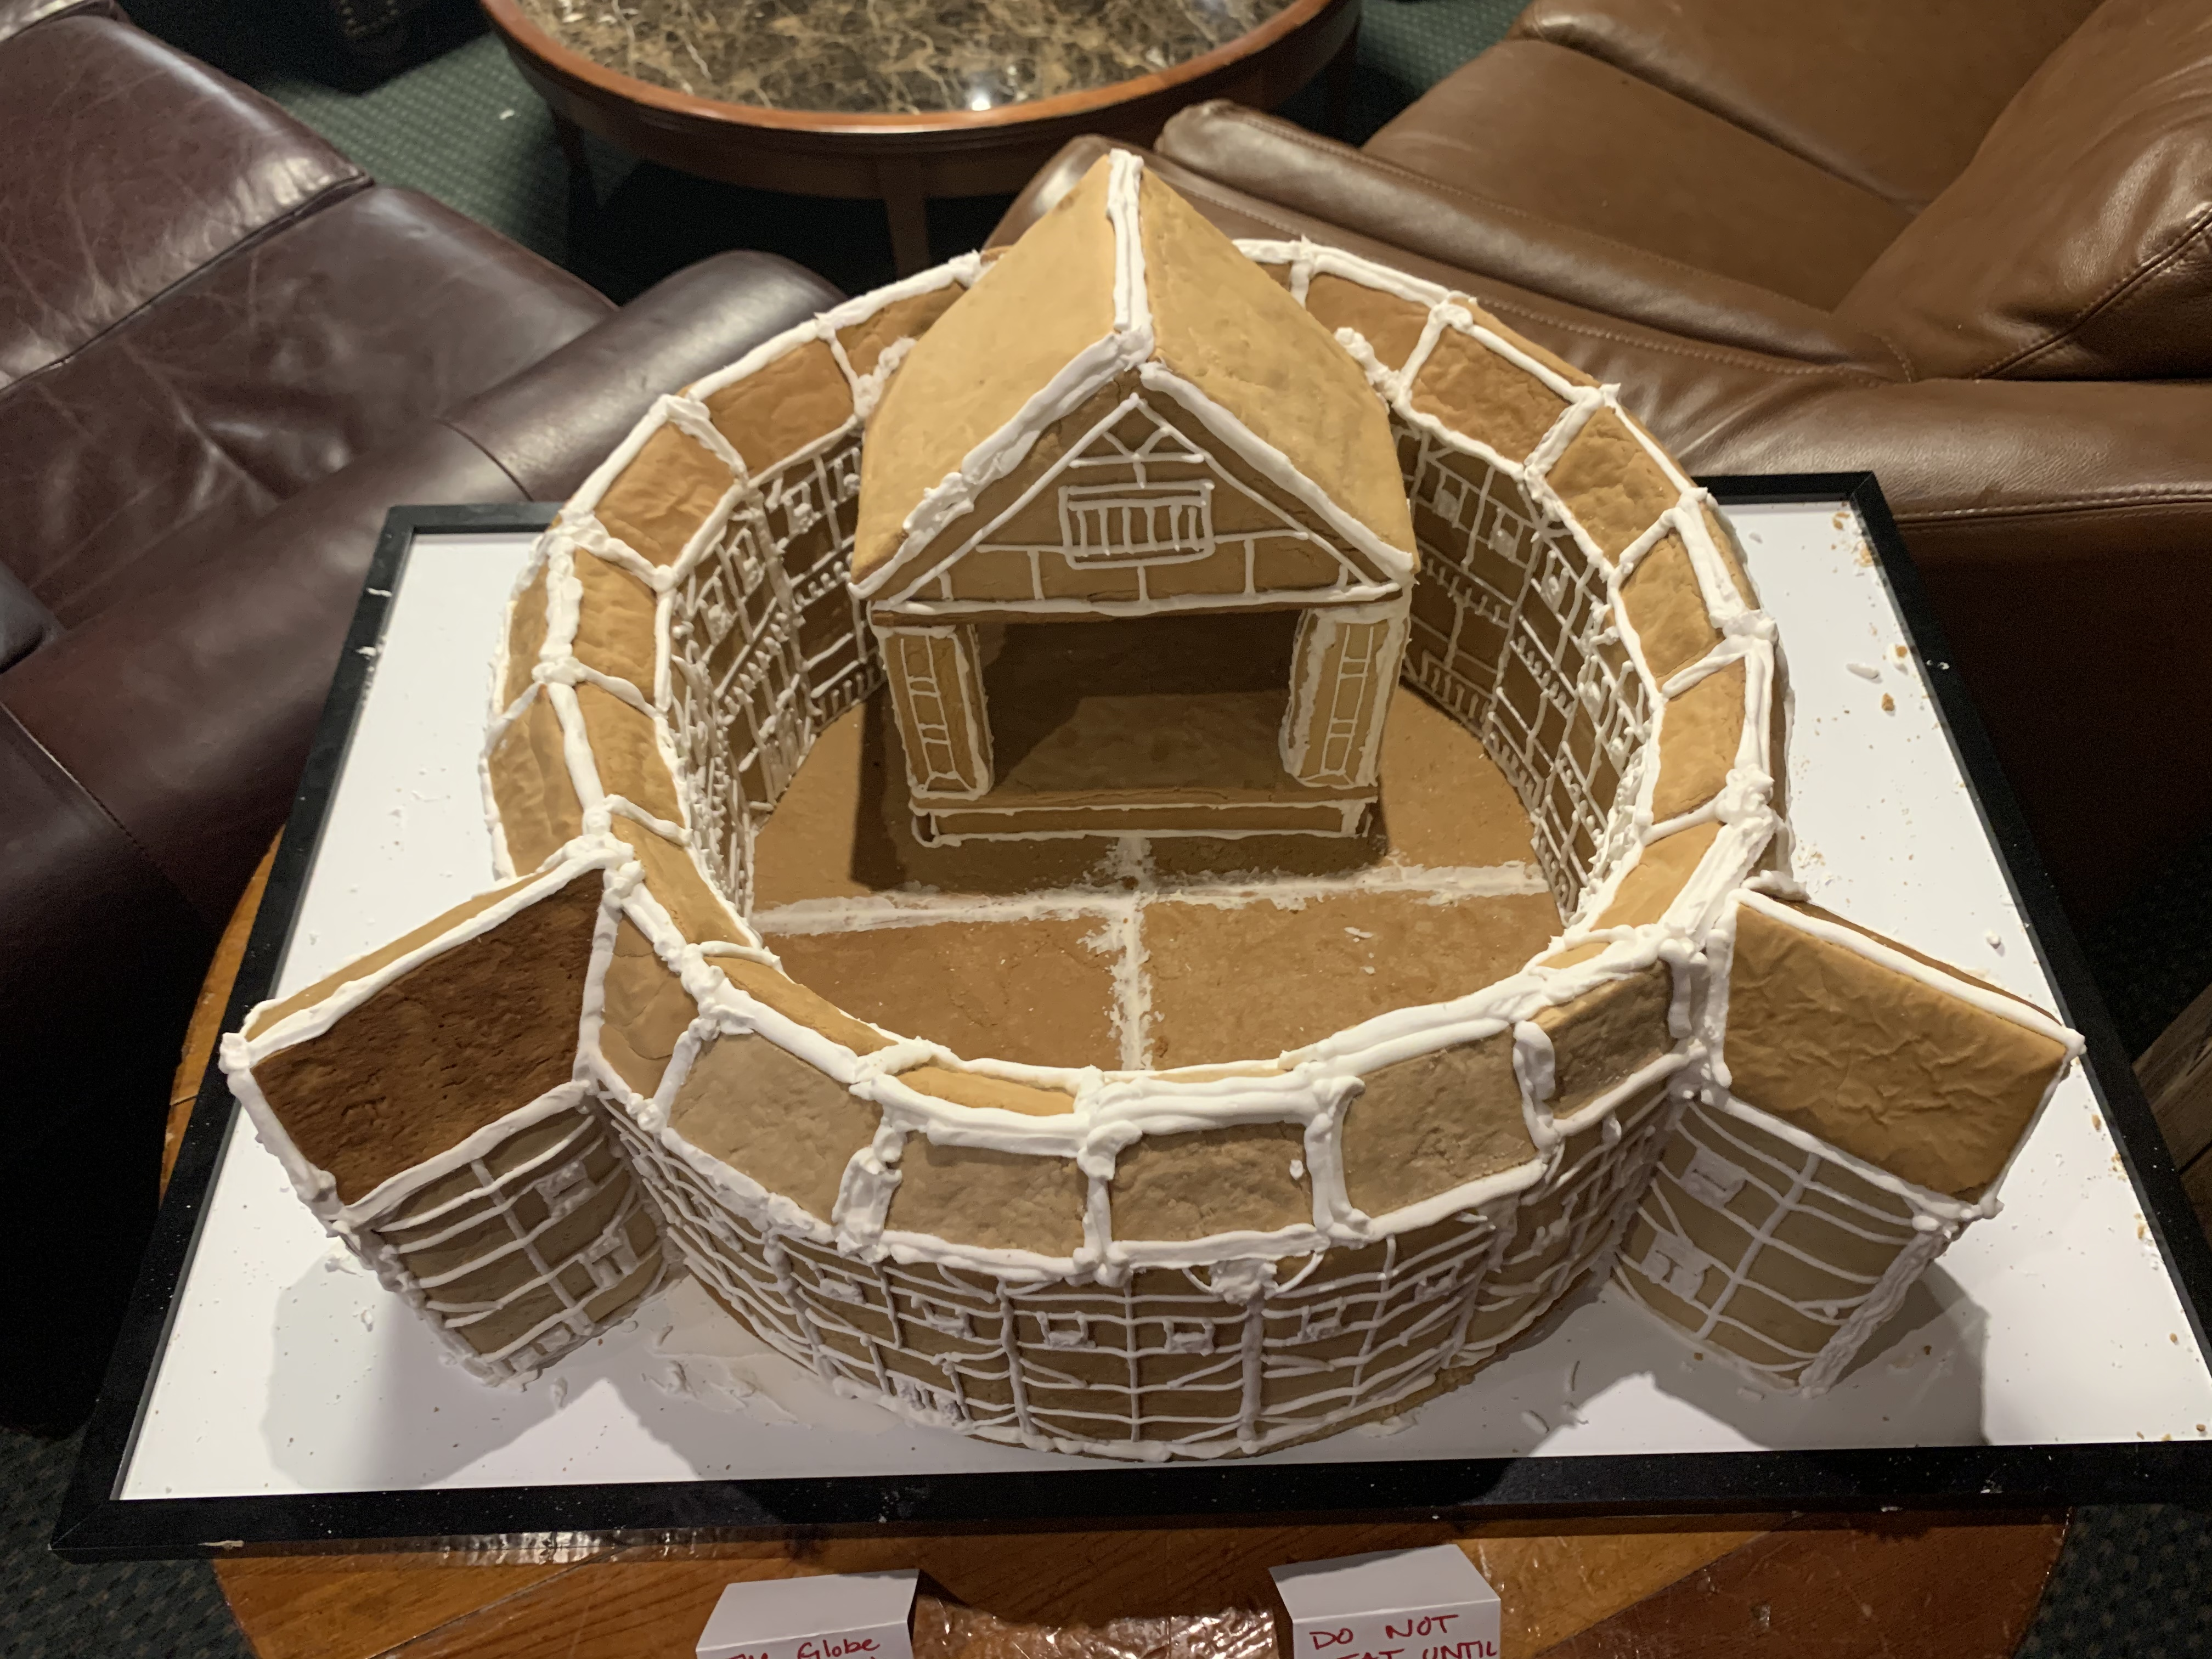 Gingerbread model of Shakespeare's Globe Theater